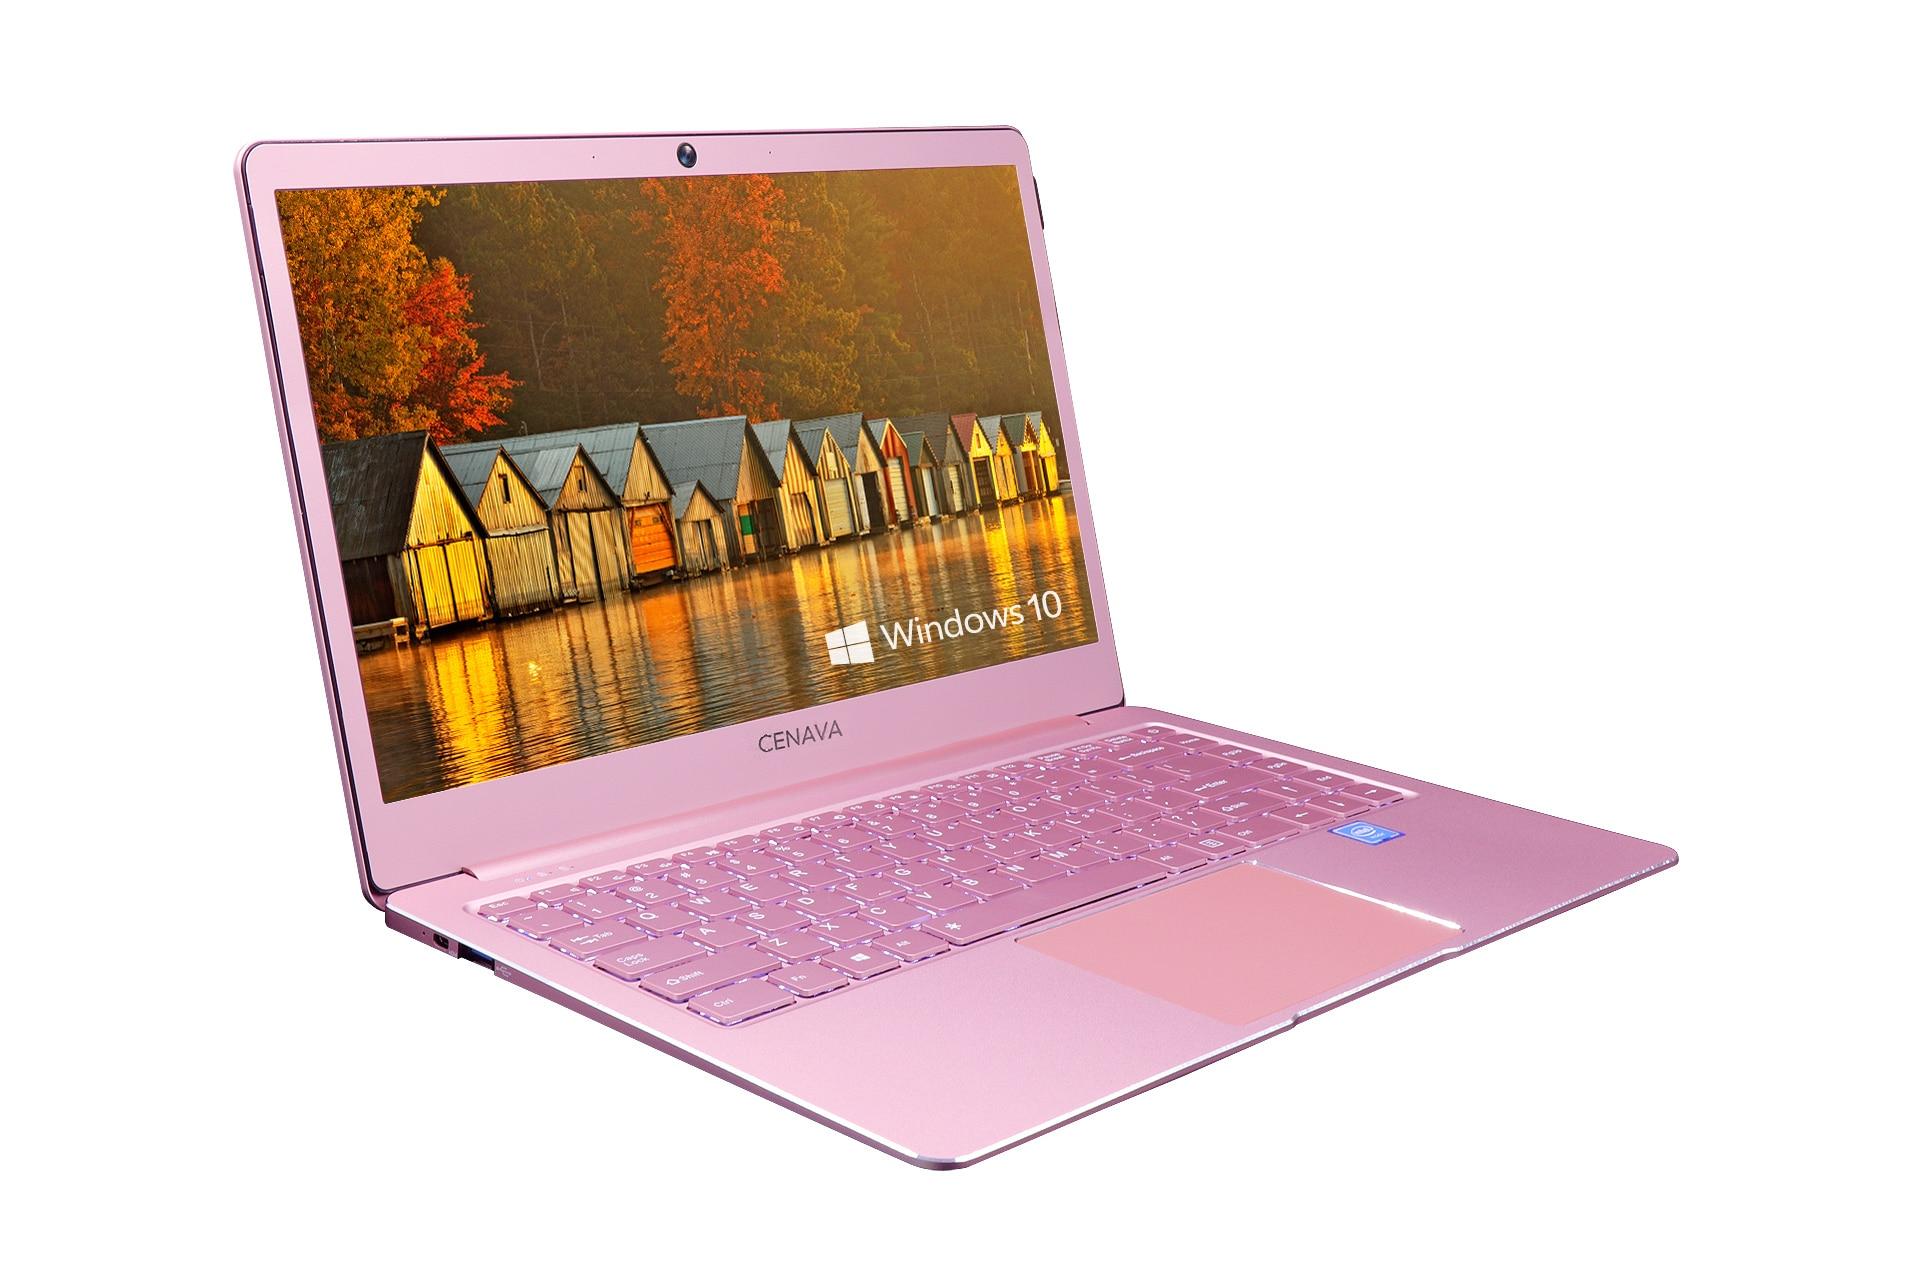 New HeroBook Pro 14.1 Inch 1920*1080 FHD IPS Screen Intel Quad Core J3455 Processor 6GB 512GB SSD Windows 10 Laptop Computer 4K